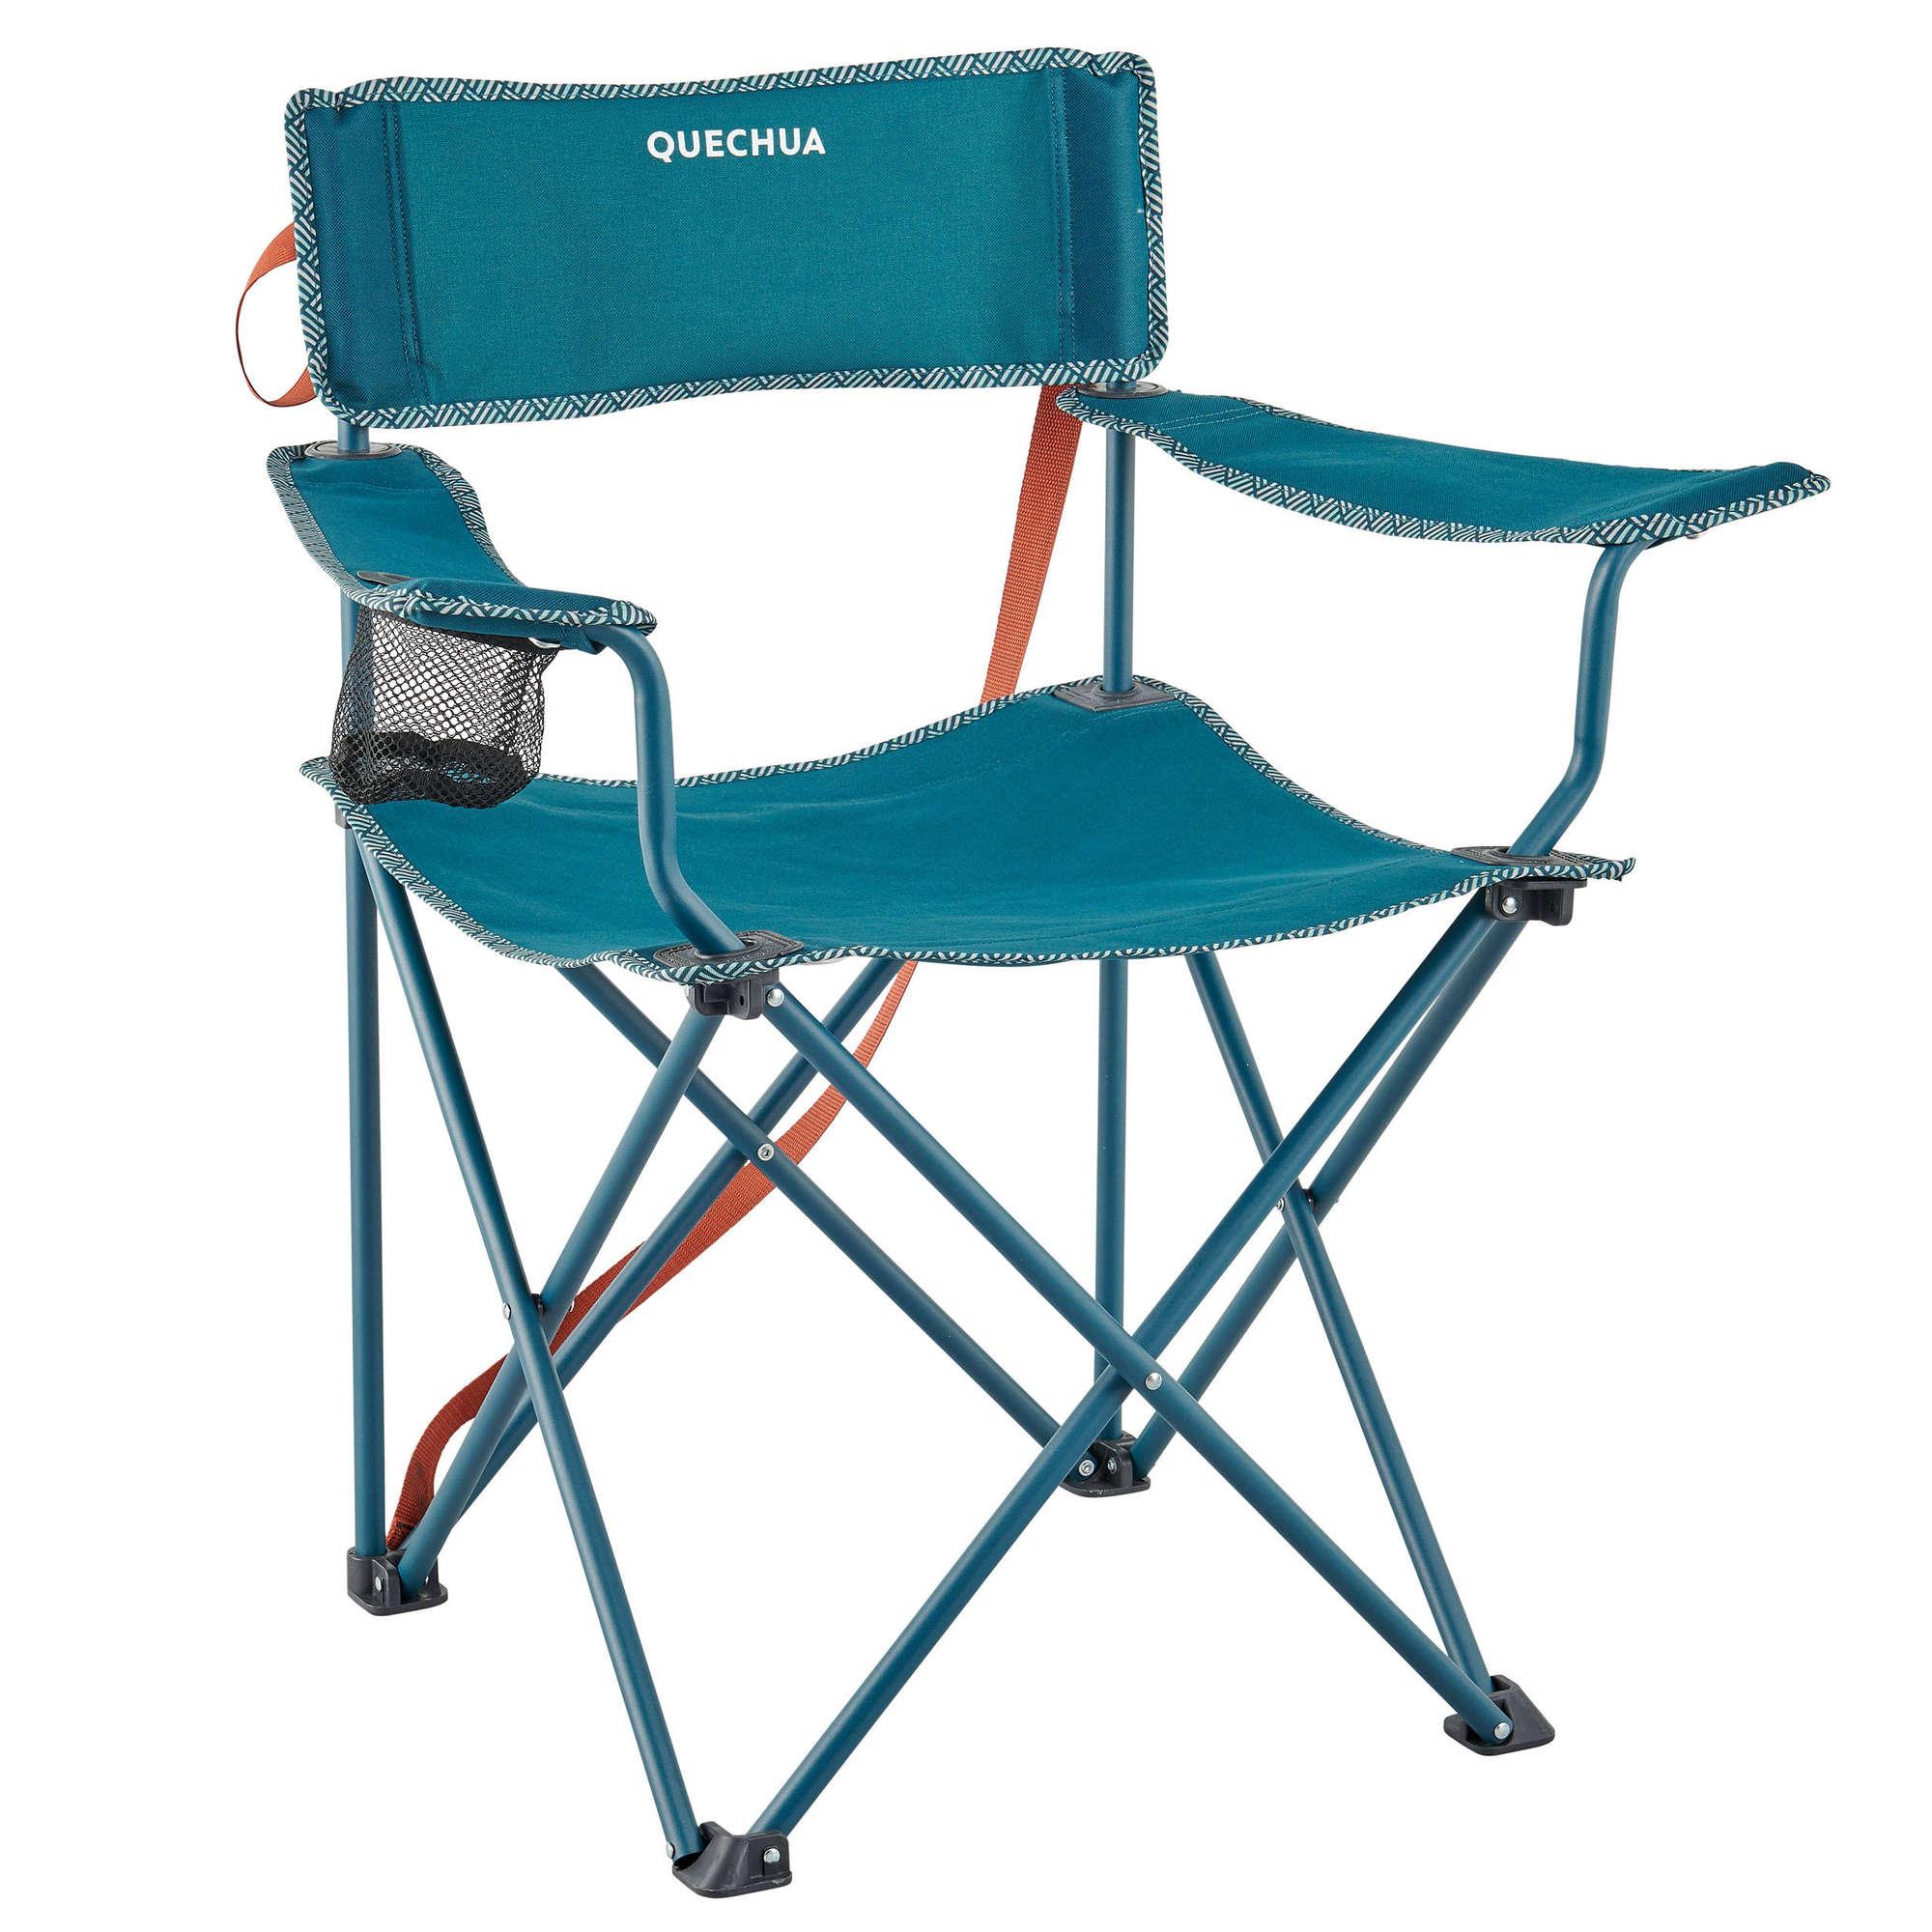 Portable Ultralight Camping Chair Outdoor Folding Fishing Chair Aluminum Alloy Beach Picnic Chair Blue